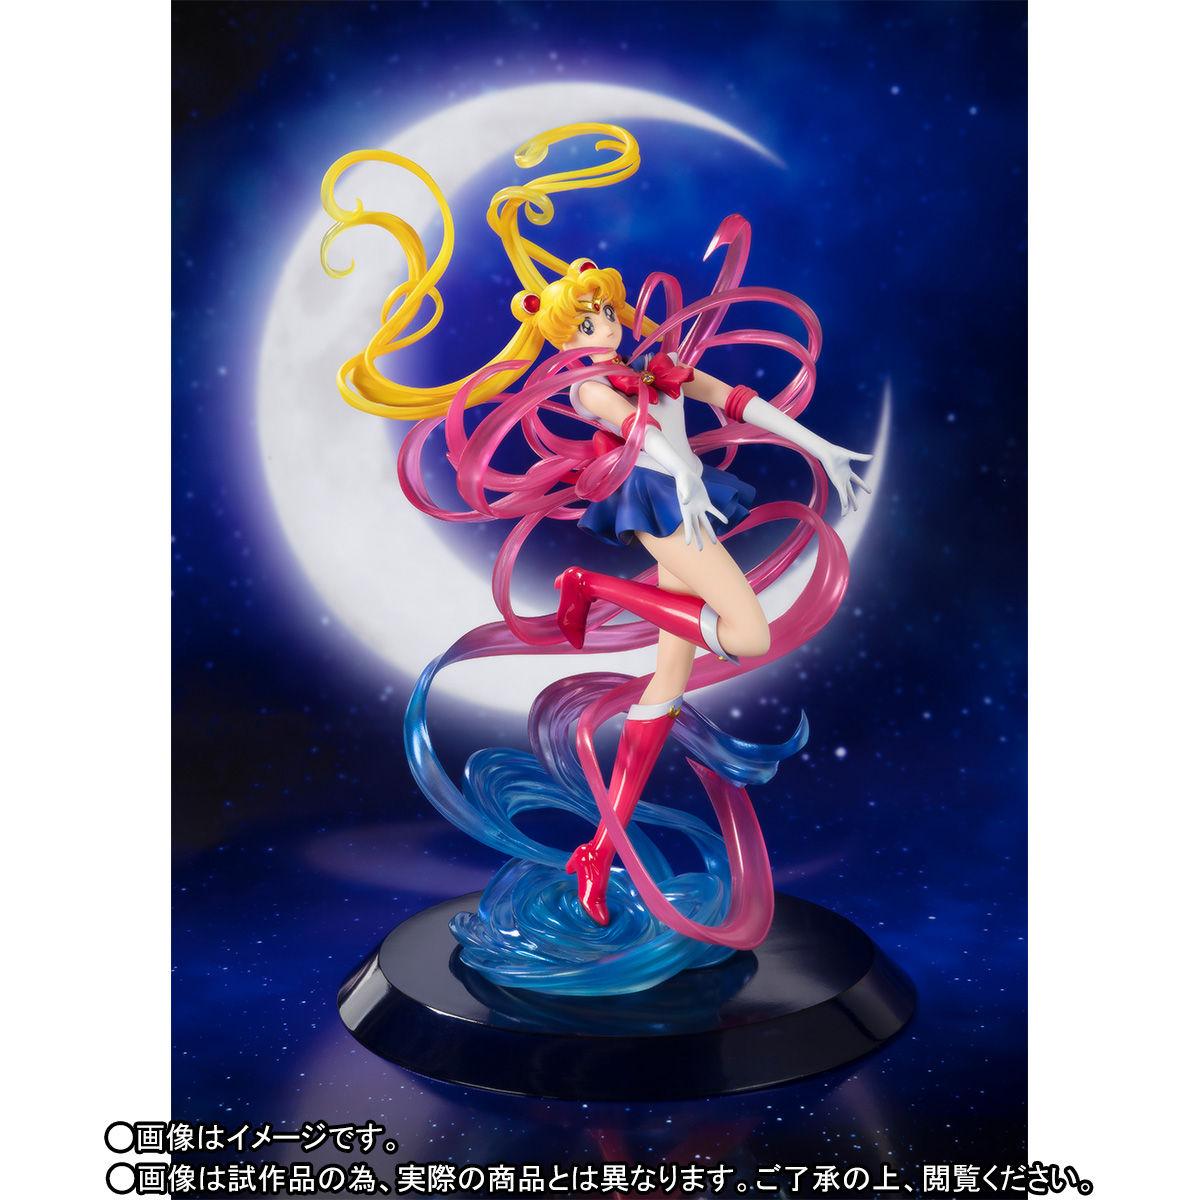 Figuarts Zero chouette『セーラームーン -Moon Crystal Power, Make Up-』完成品フィギュア-002